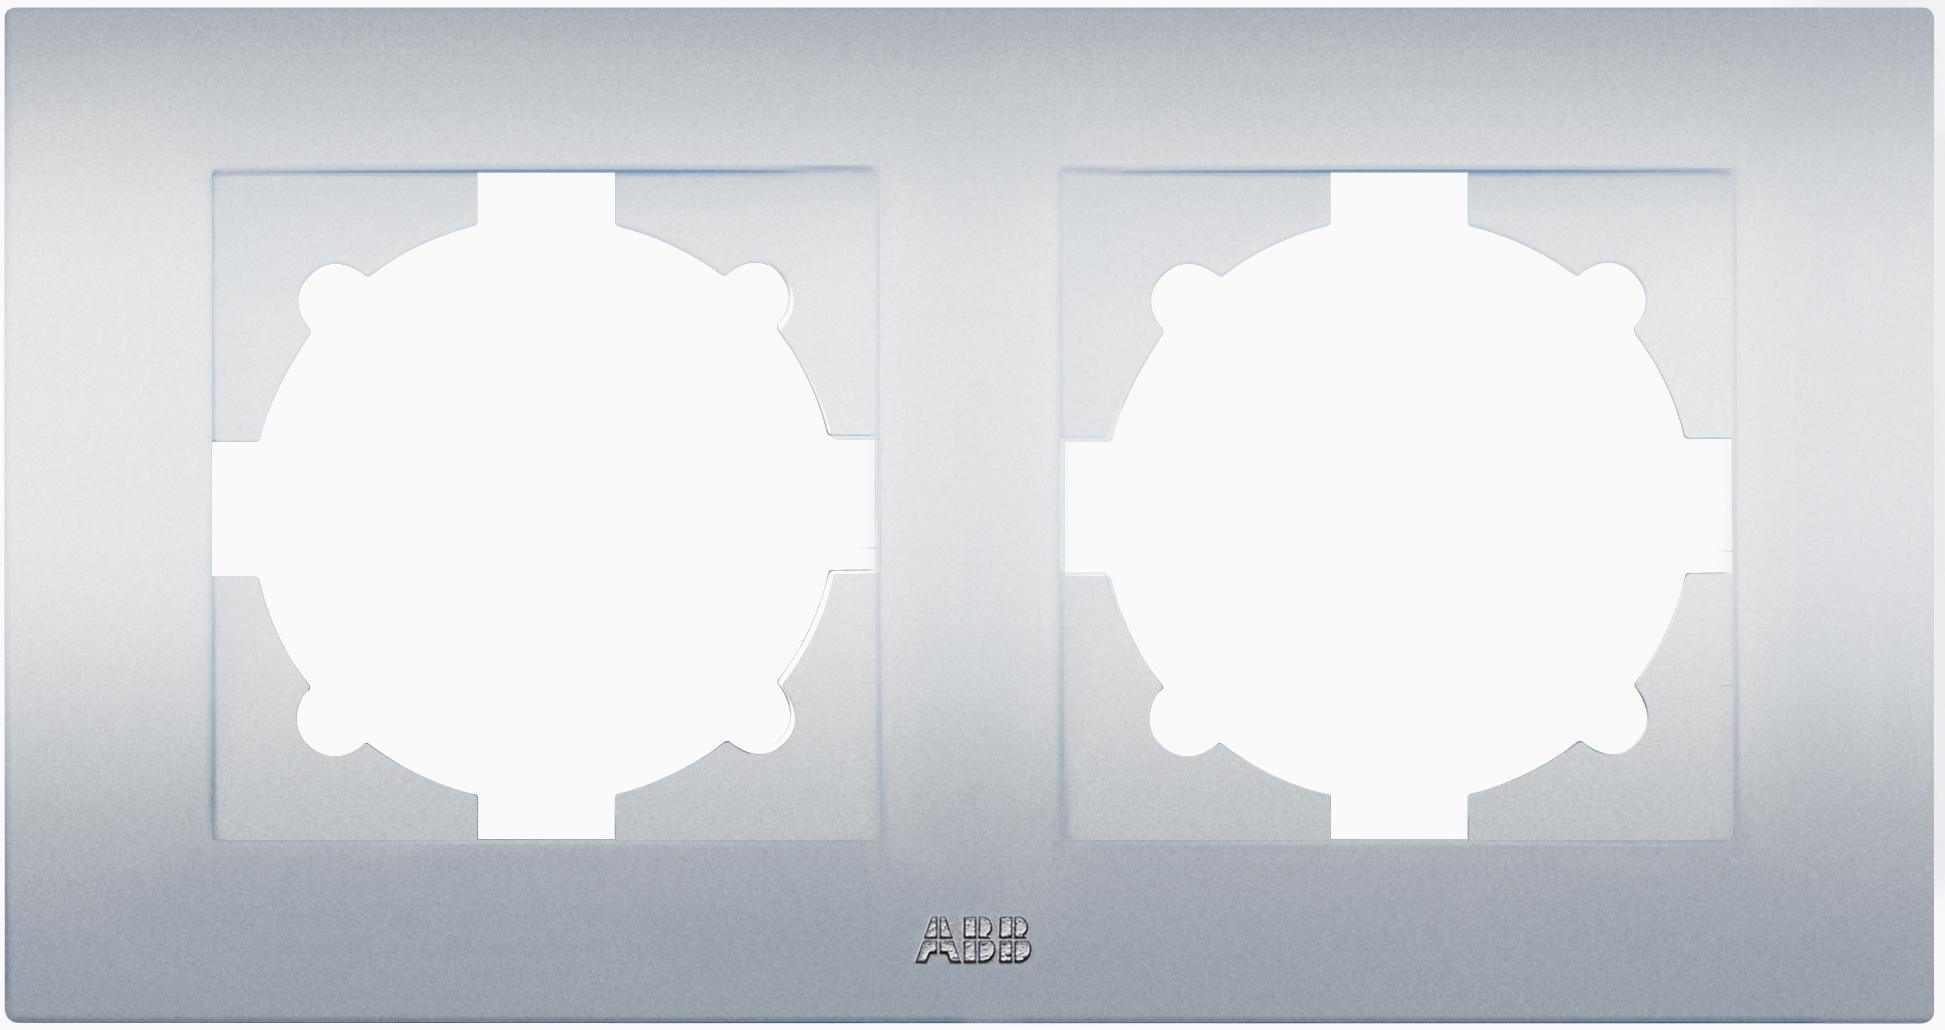 Рамка Abb Cosmo 612-011000-226 телефонная розетка abb bjb basic 55 шато 1 разъем цвет черный